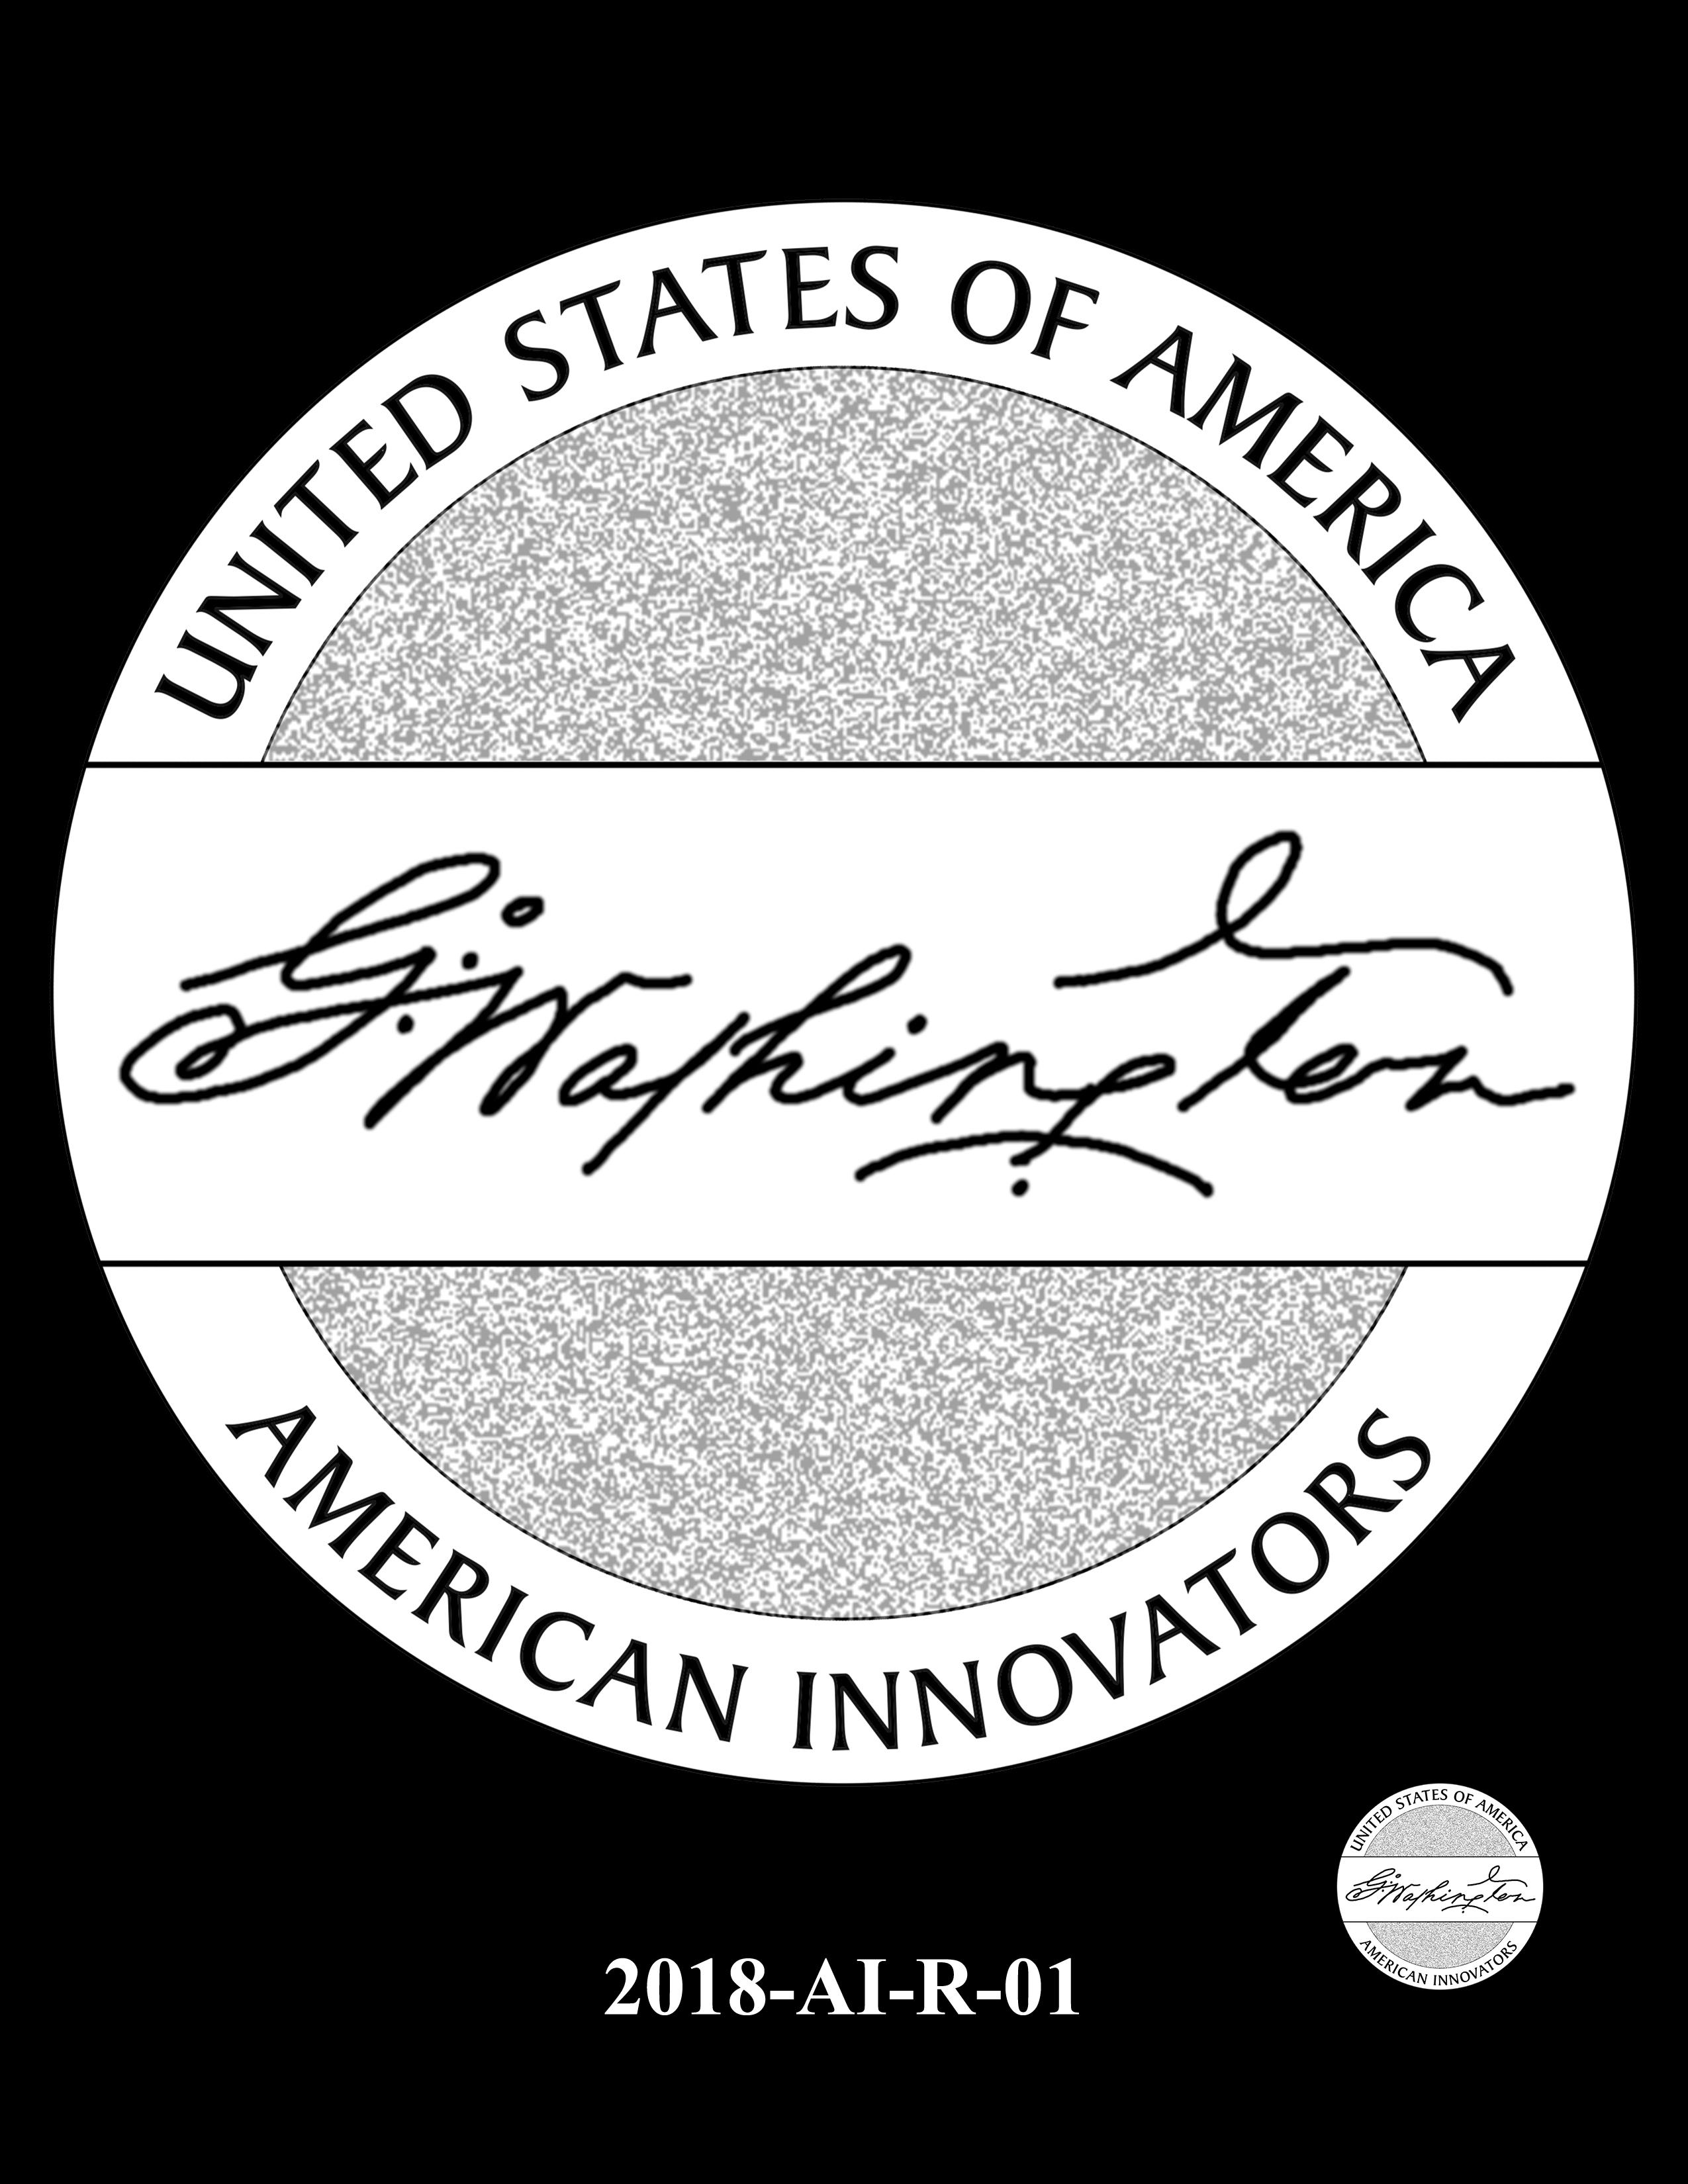 2018-AI-R-01 -- 2018 American Innovation $1 Coin